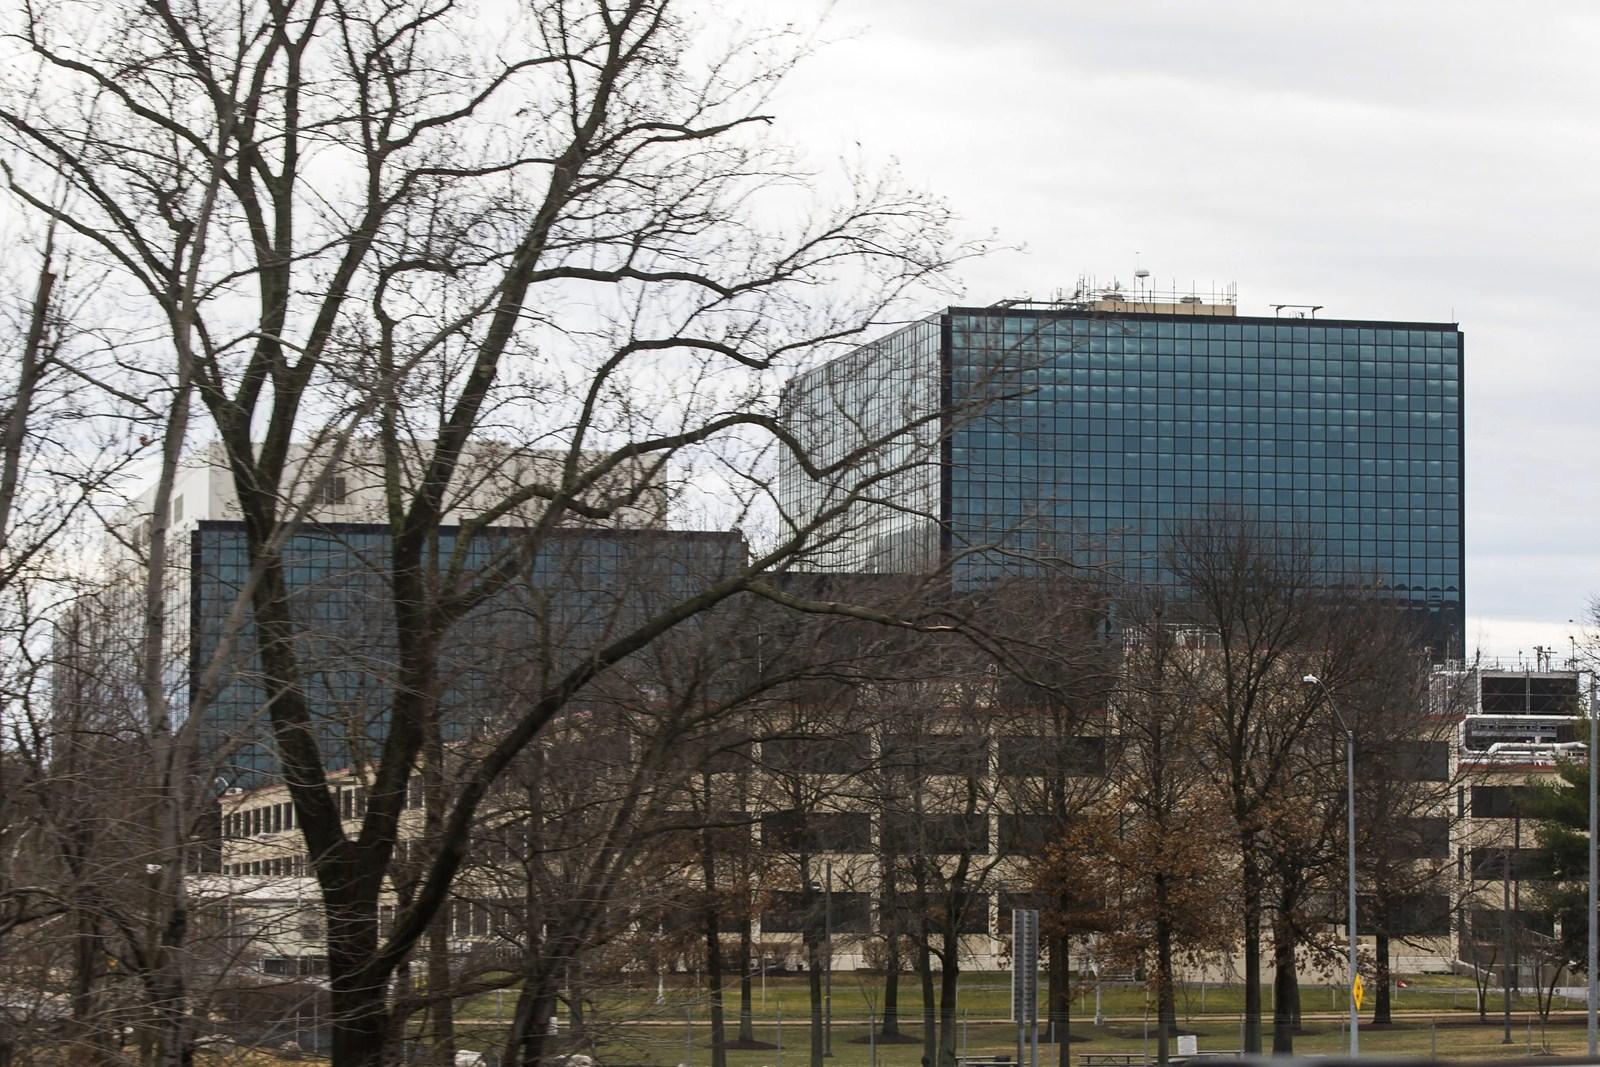 Key NSA hacking tools turn up online - Northwest